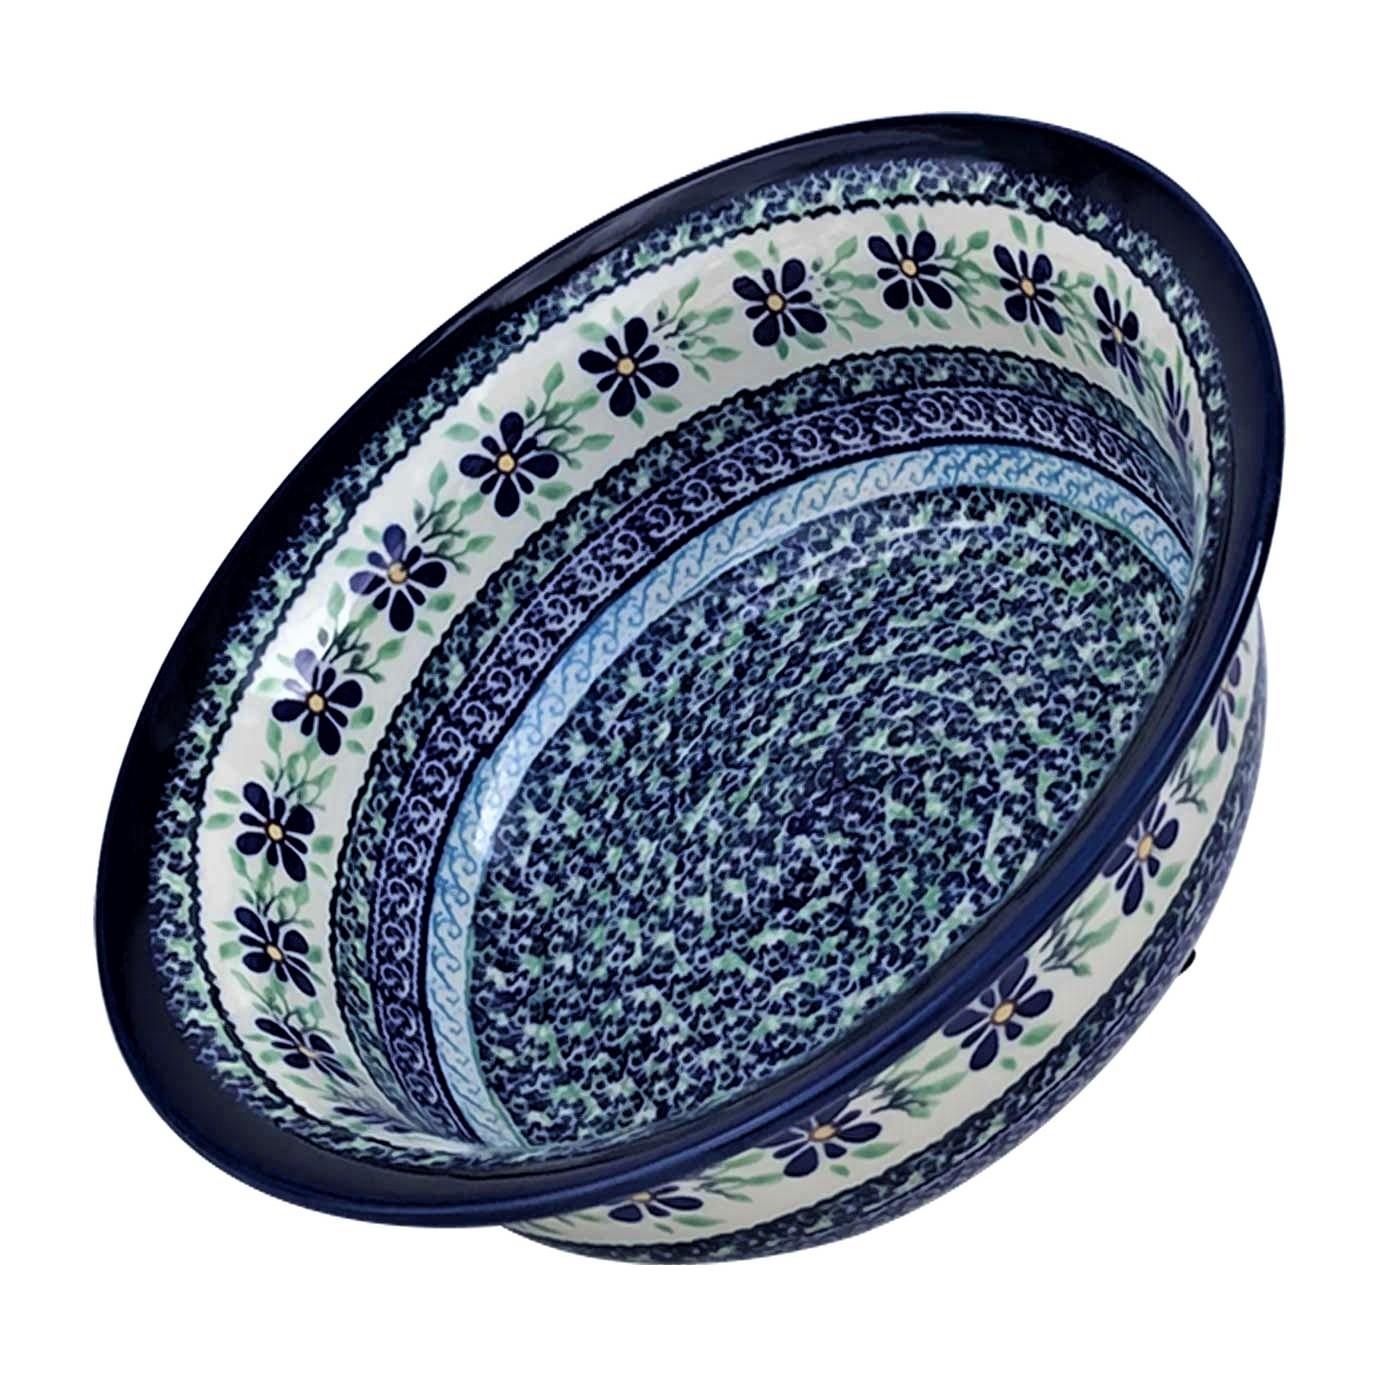 Pottery Avenue 61-ounce Flared Top All Purpose Stoneware Bowl - 1605-DU121 Dearest Friend